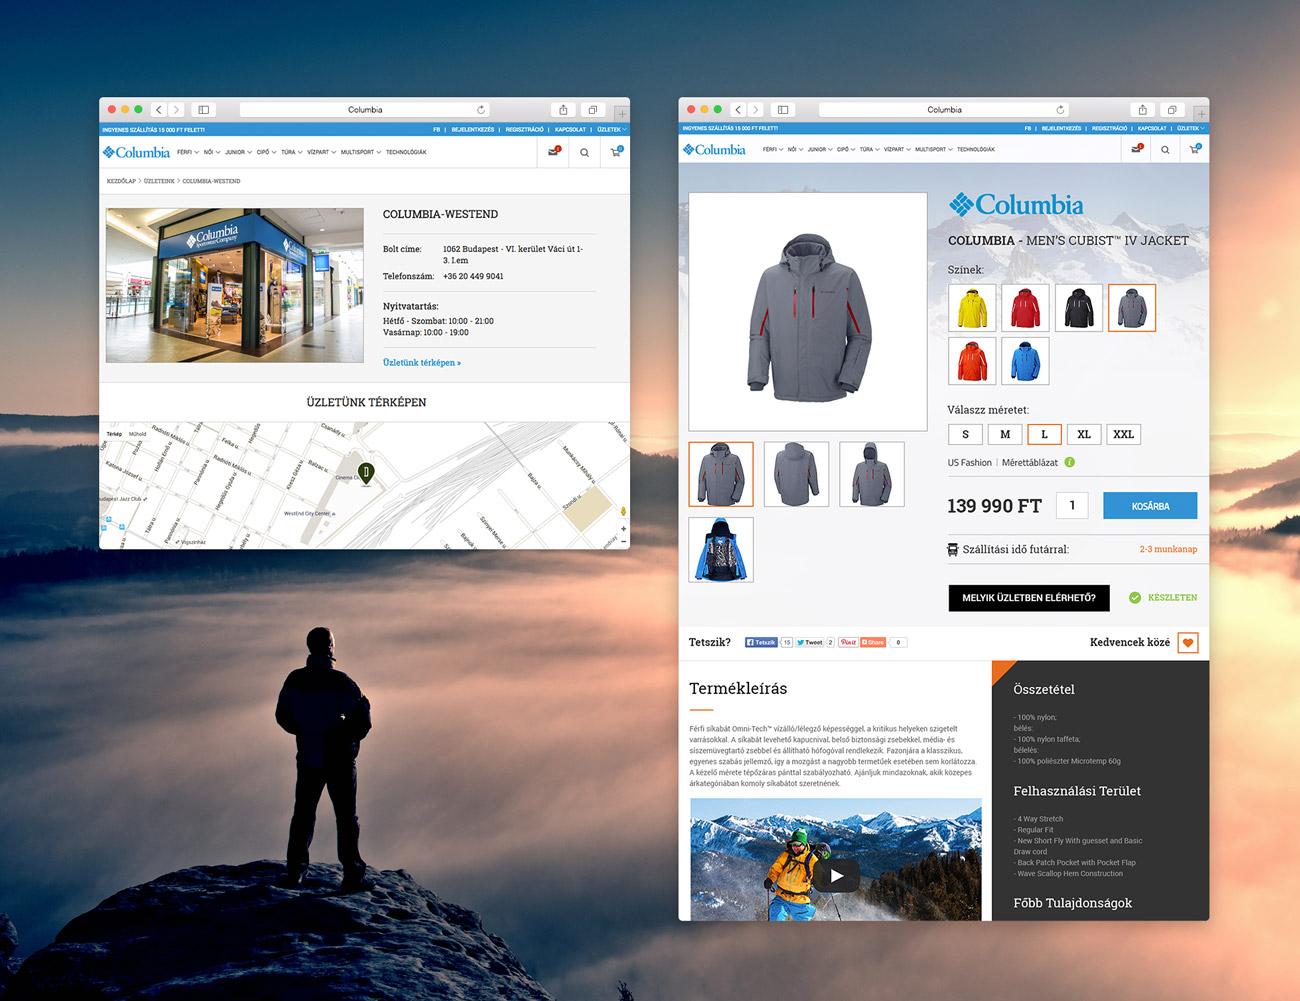 Columbia webshop